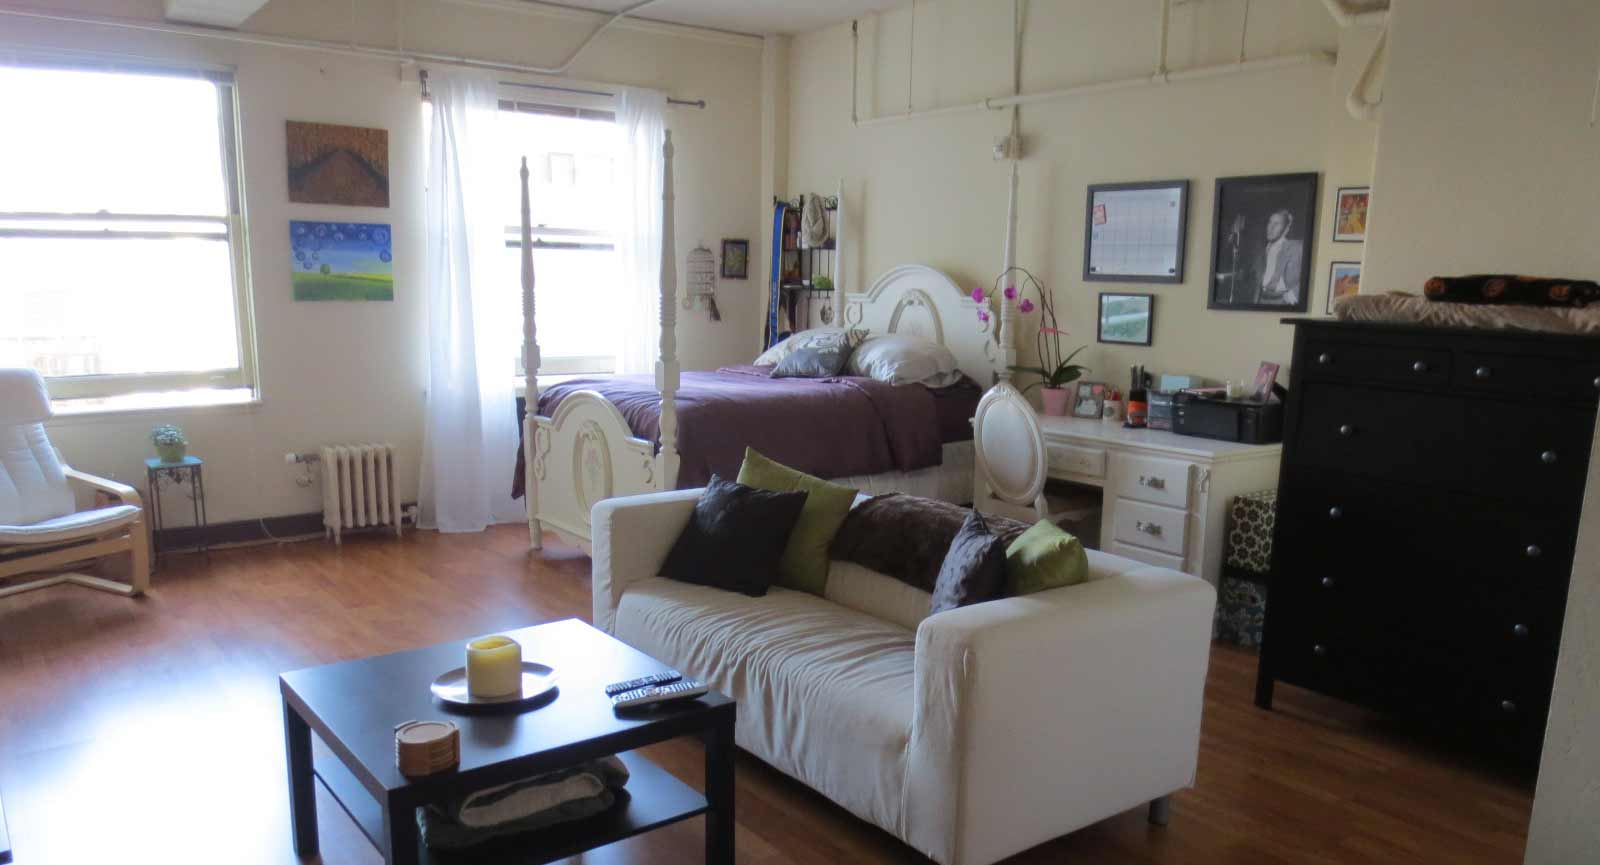 Uc hastings housing services studio units